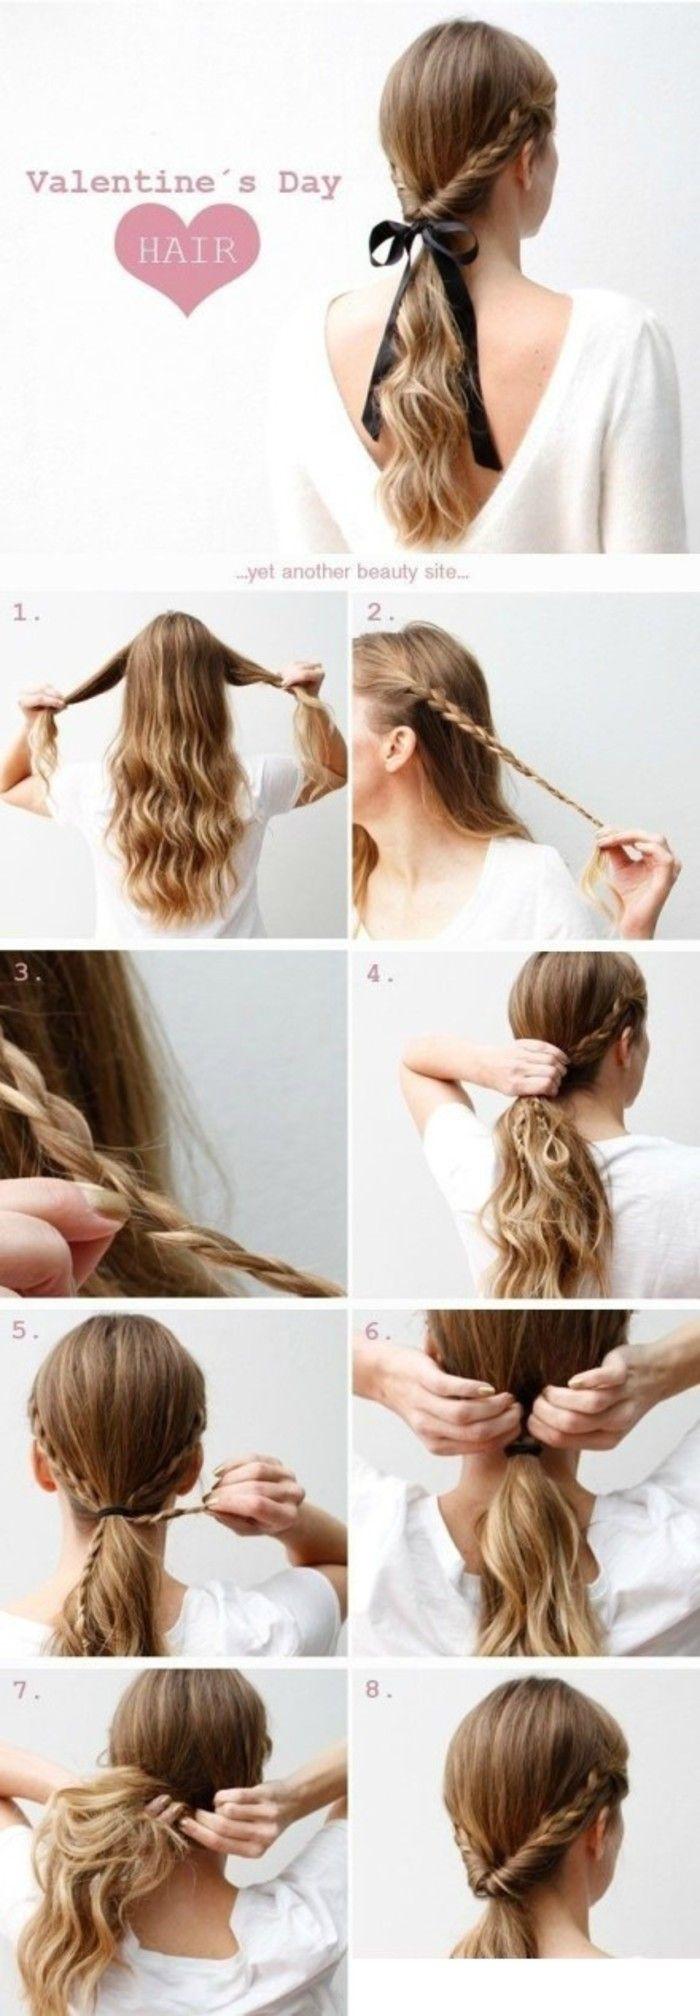 Pin By Shin Rin Ah On Braids And Hairsyle Easy Hairdos Long Hair Styles Hair Styles